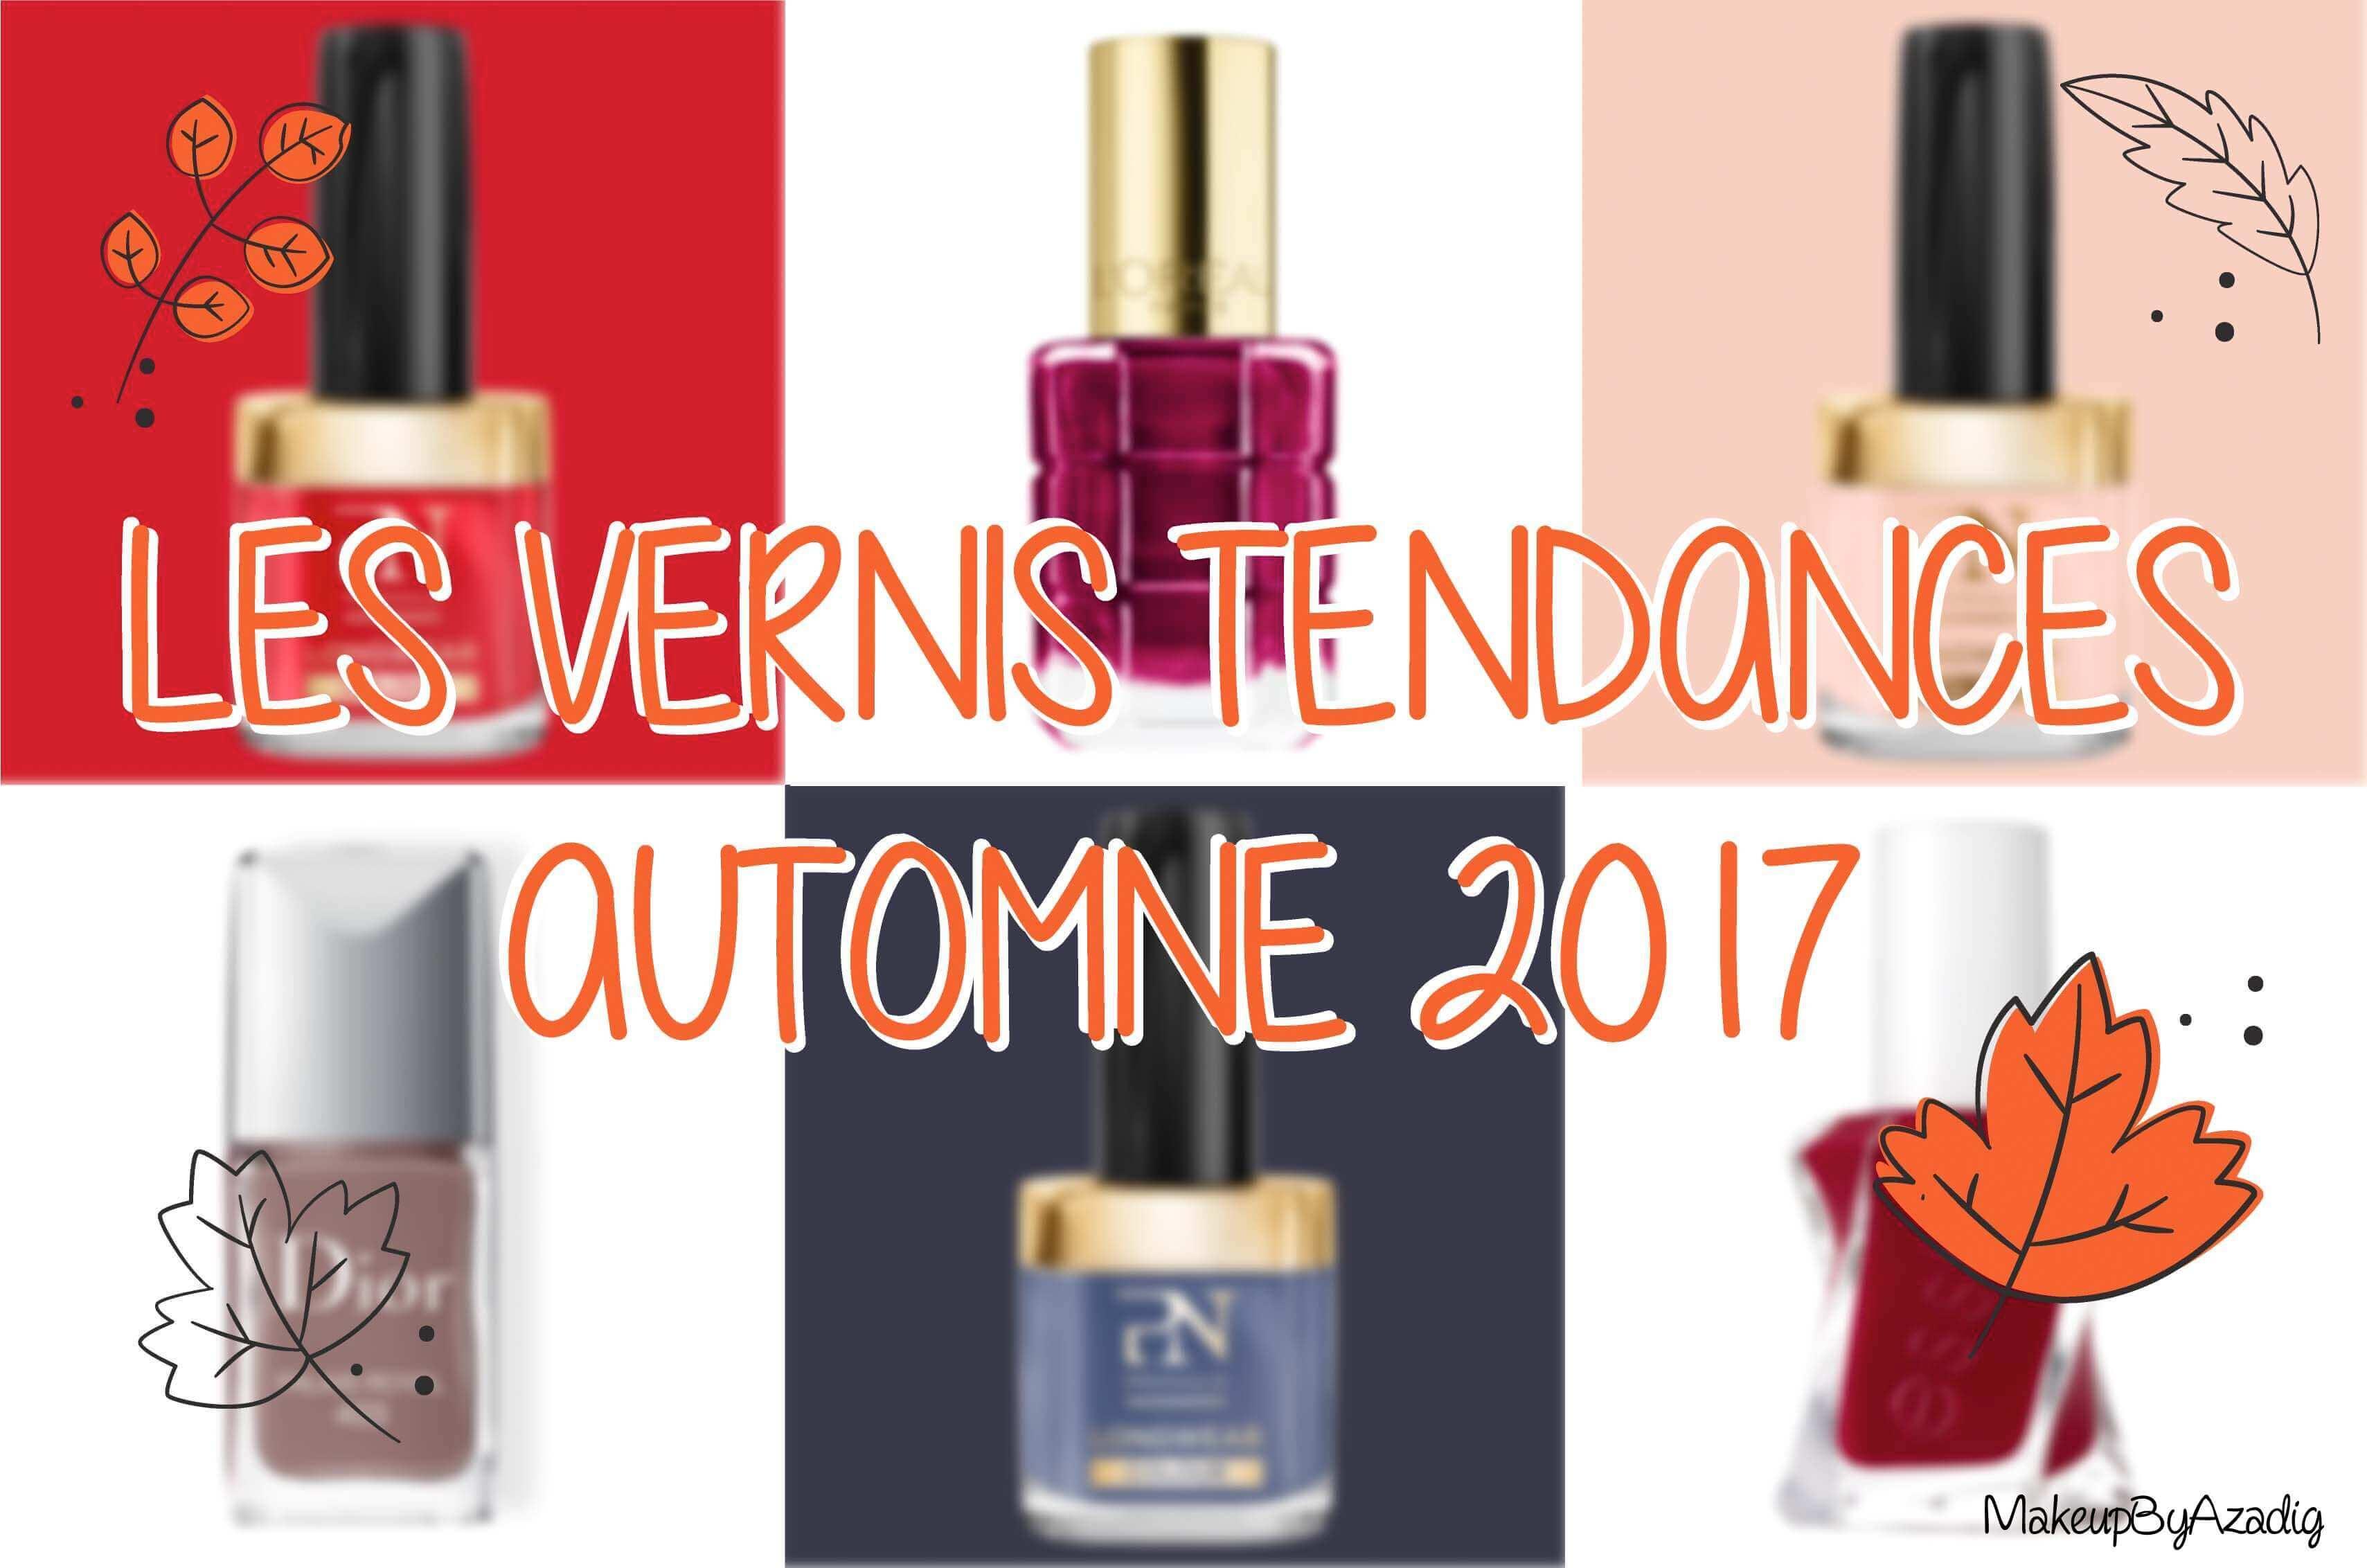 vernis-tendances-automne-2017-guerlain-essie-opi-kiko-pronails-rouge-kakik-makeupbyazadig